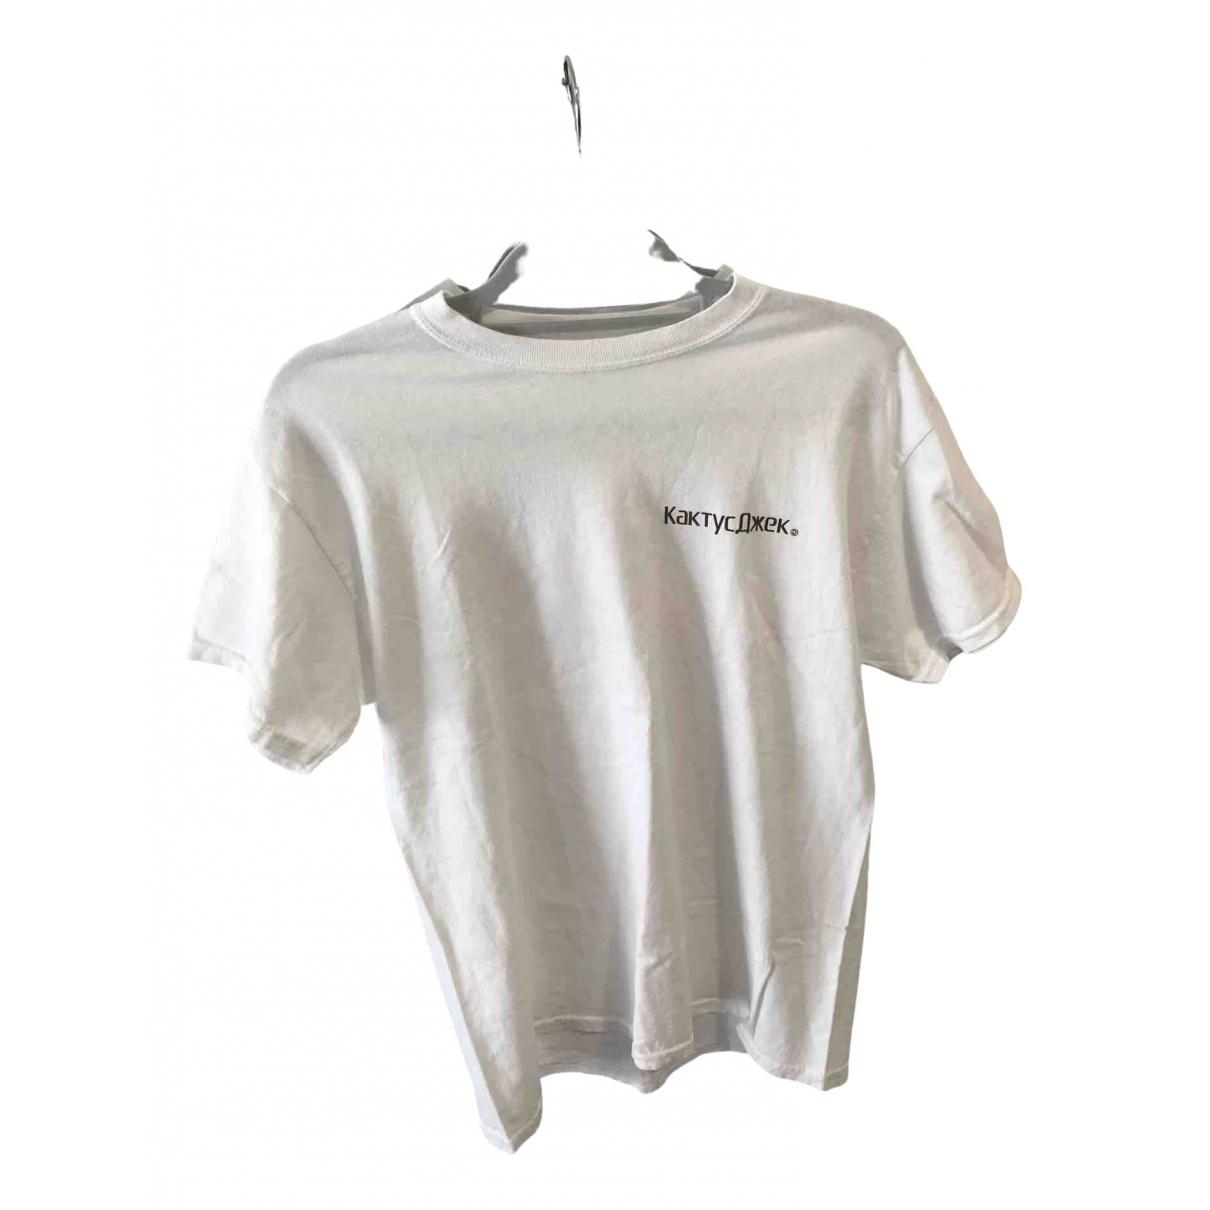 Travis Scott - Tee shirts   pour homme - blanc